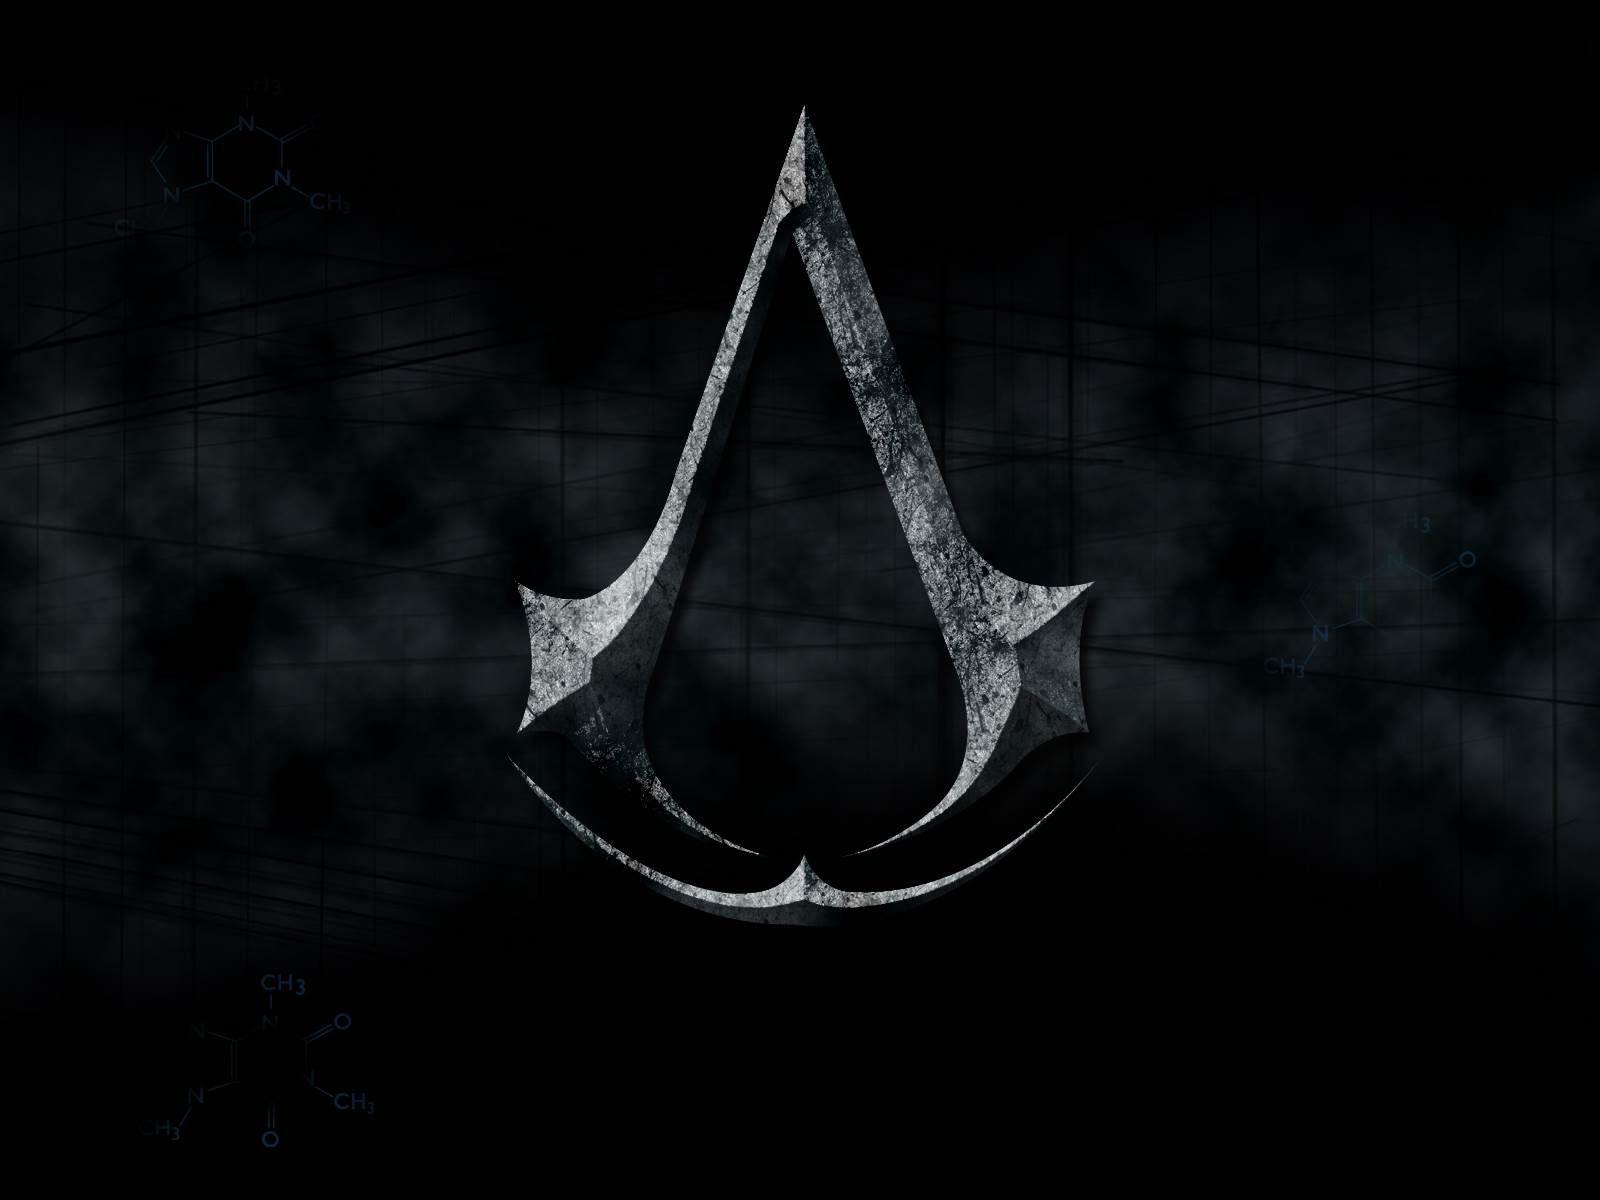 Download Assassins Creed Widescreen Wallpaper Full Hd Wallpapers 1024 578 Assassins Wallpapers Adorable Wal Imagens Aleatorias Jogos De Video Game Tatuagens